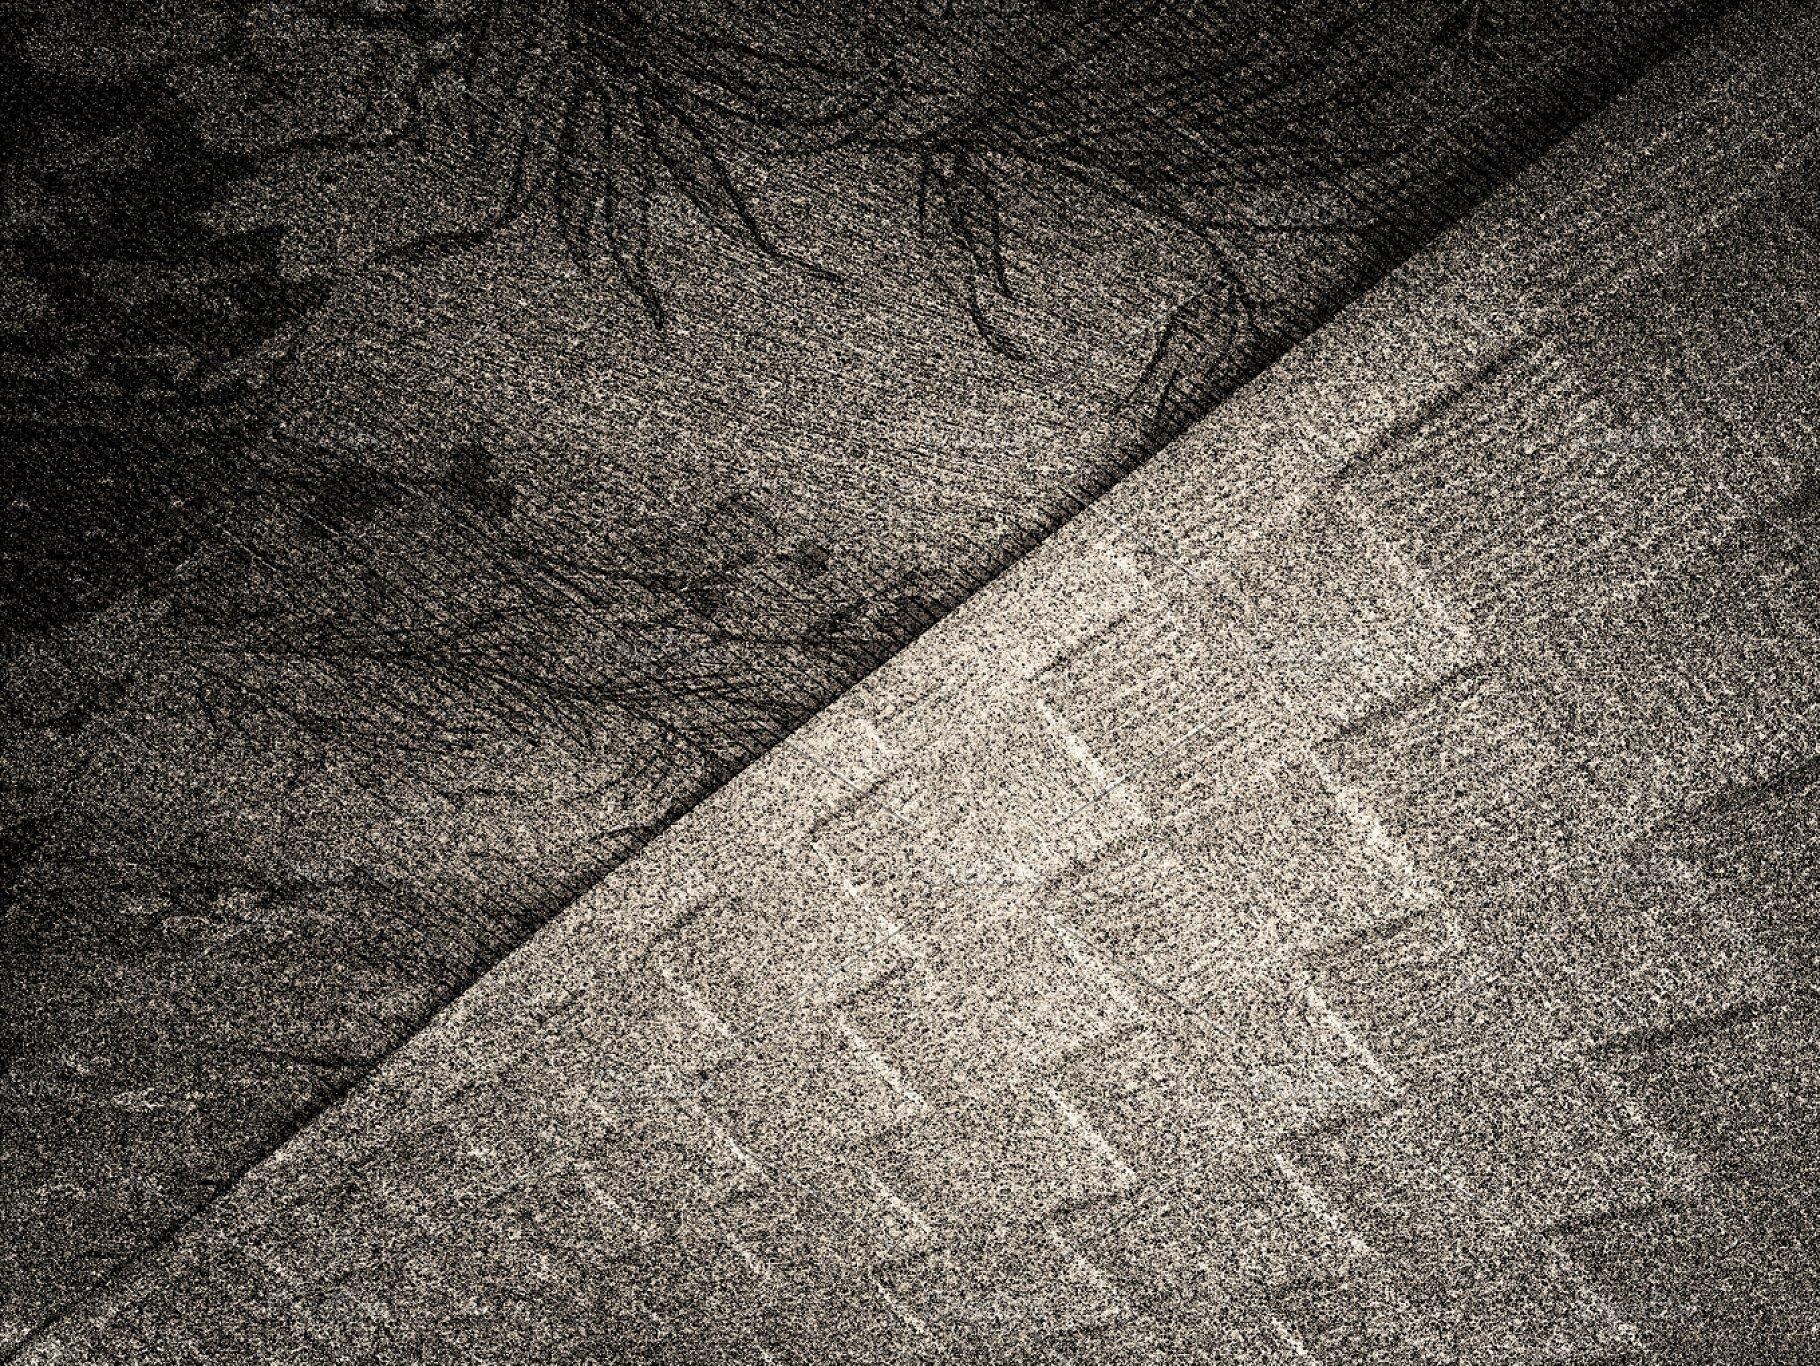 Diagonal black and white noise texture background